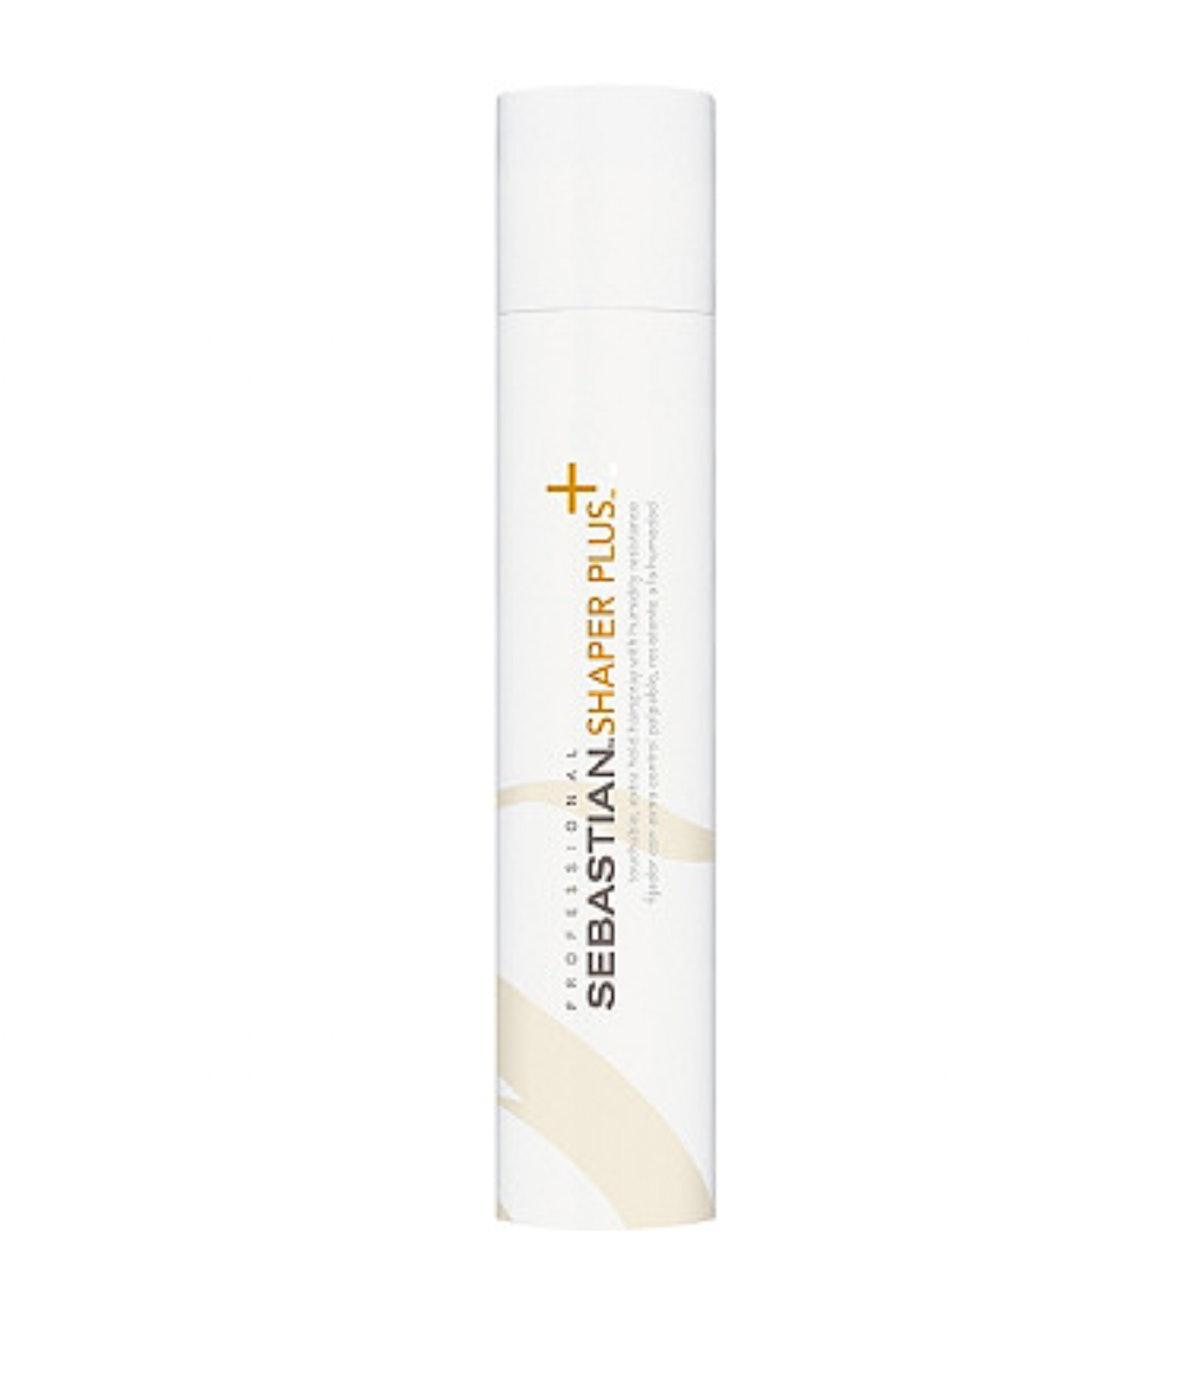 Shaper Plus Extra Hold Hairspray